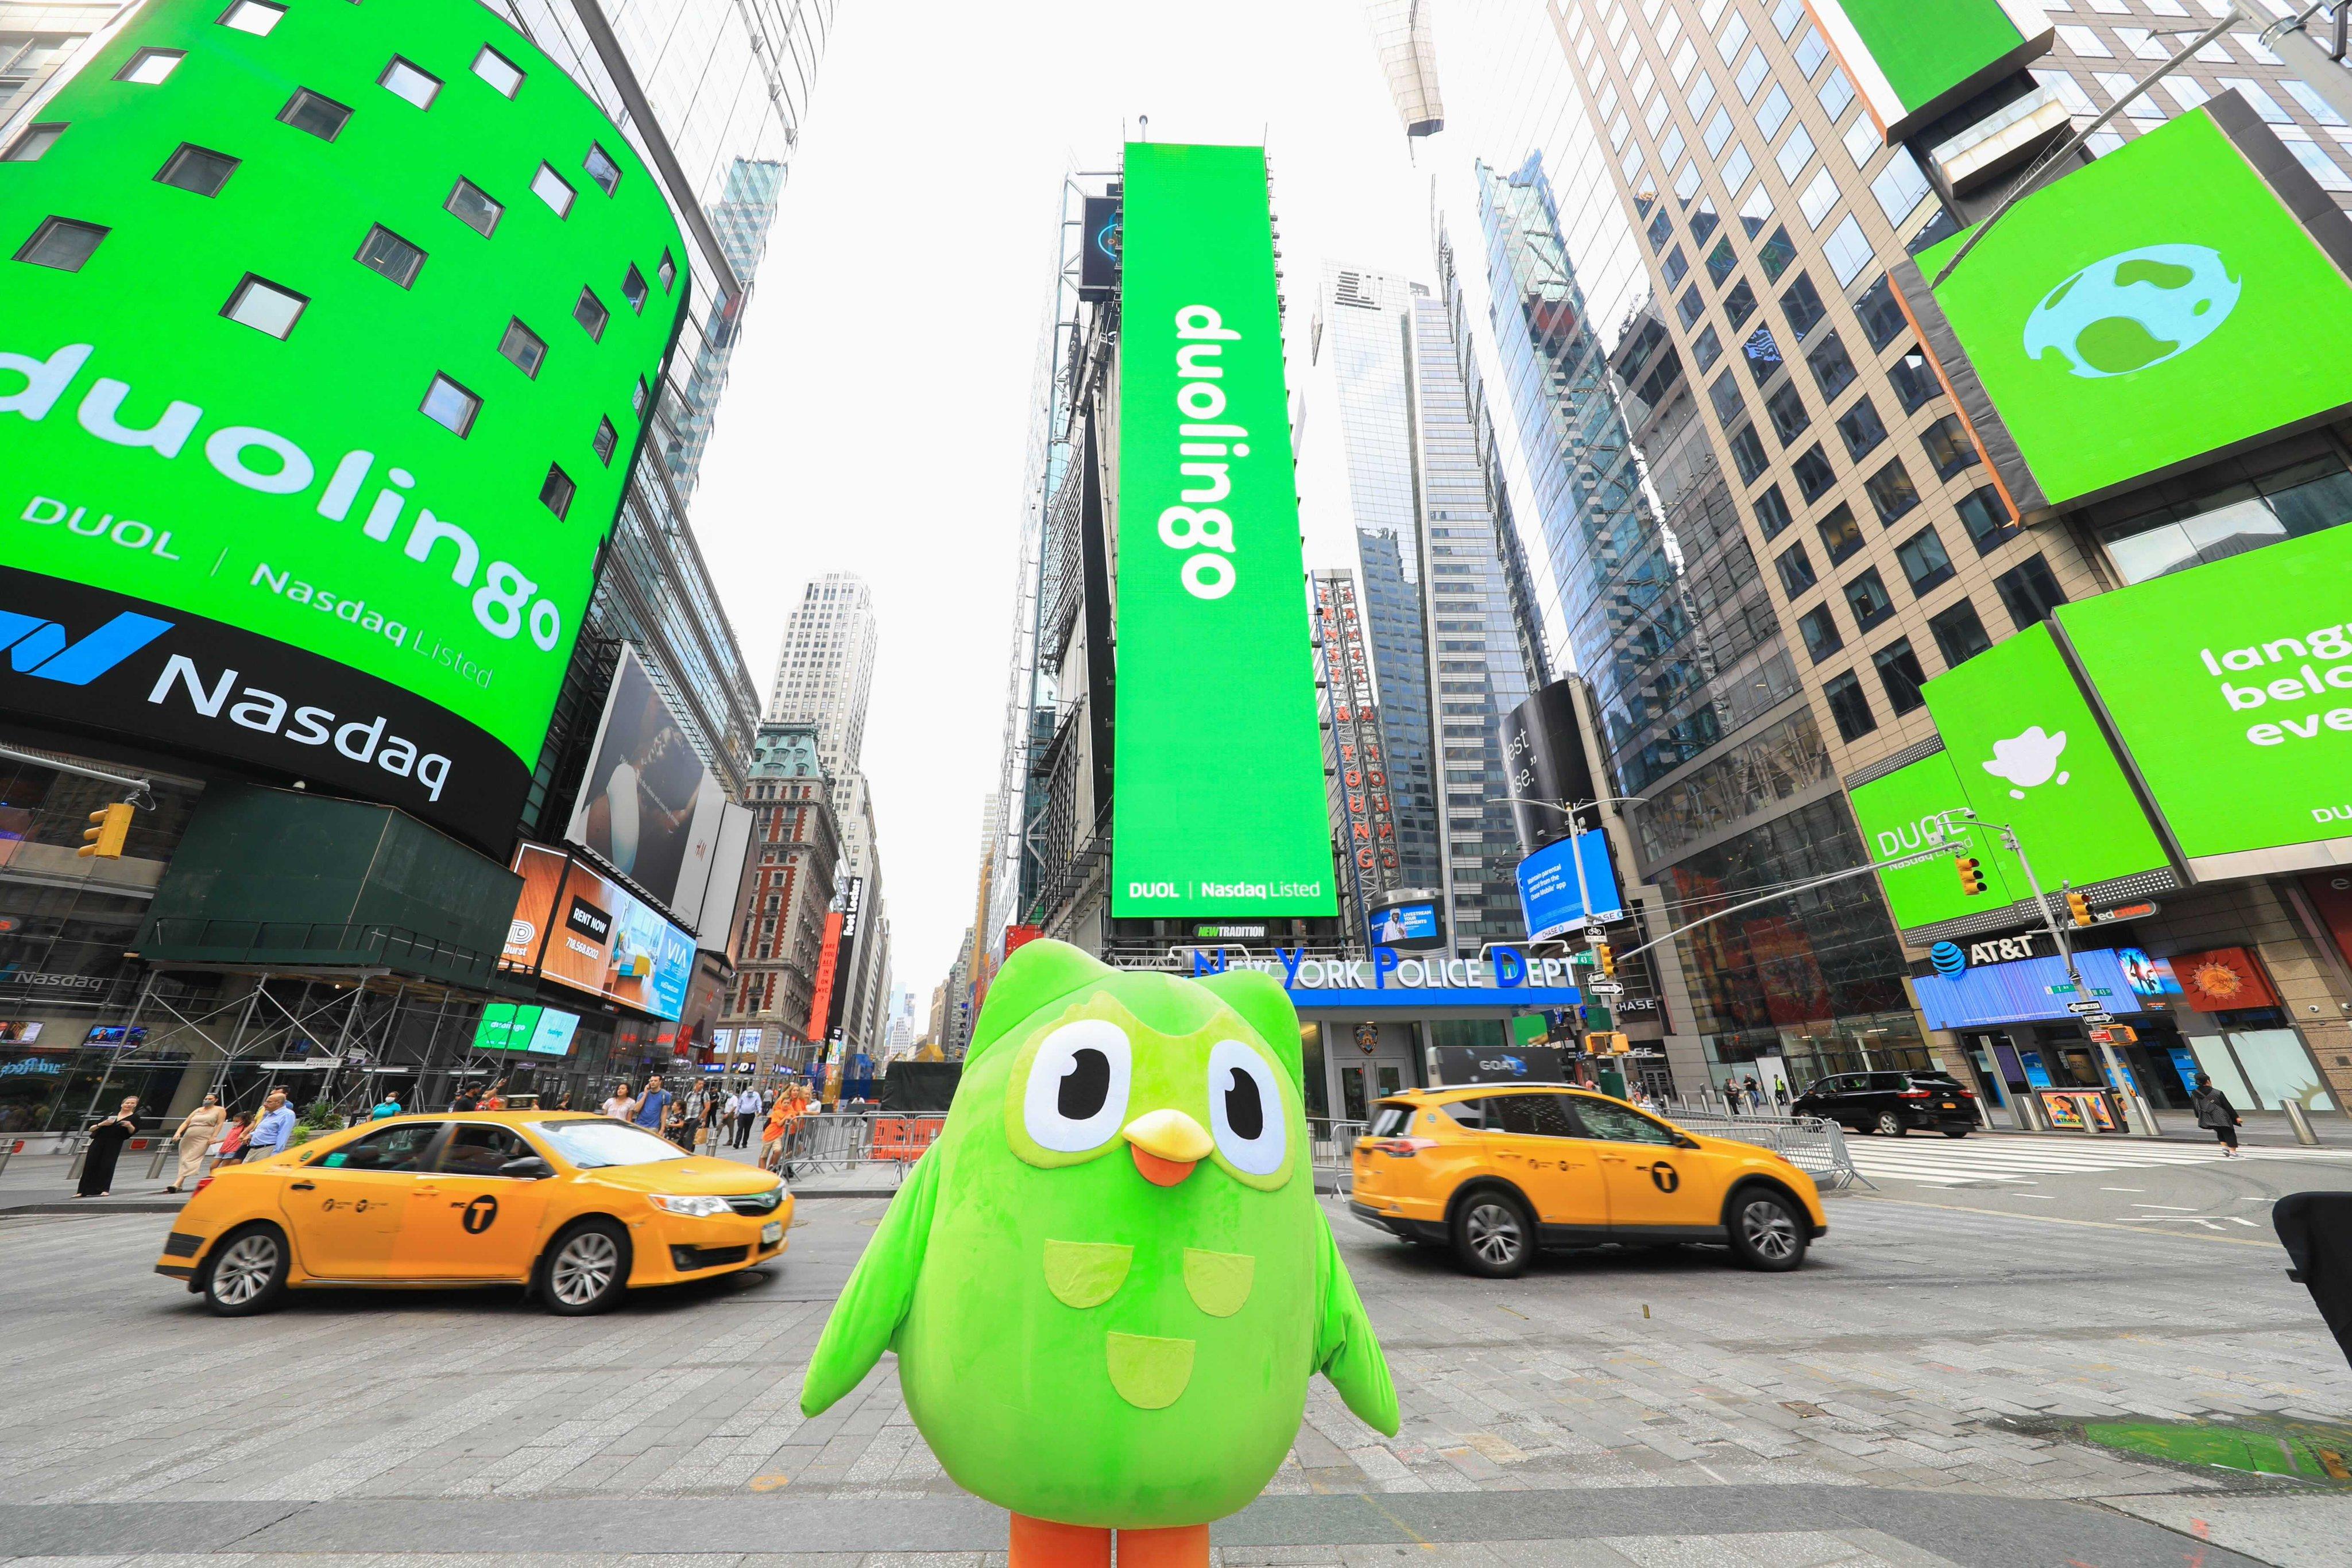 Duolingo v úvodní den na Wall Street (zdroj: Duolingo Facebook)